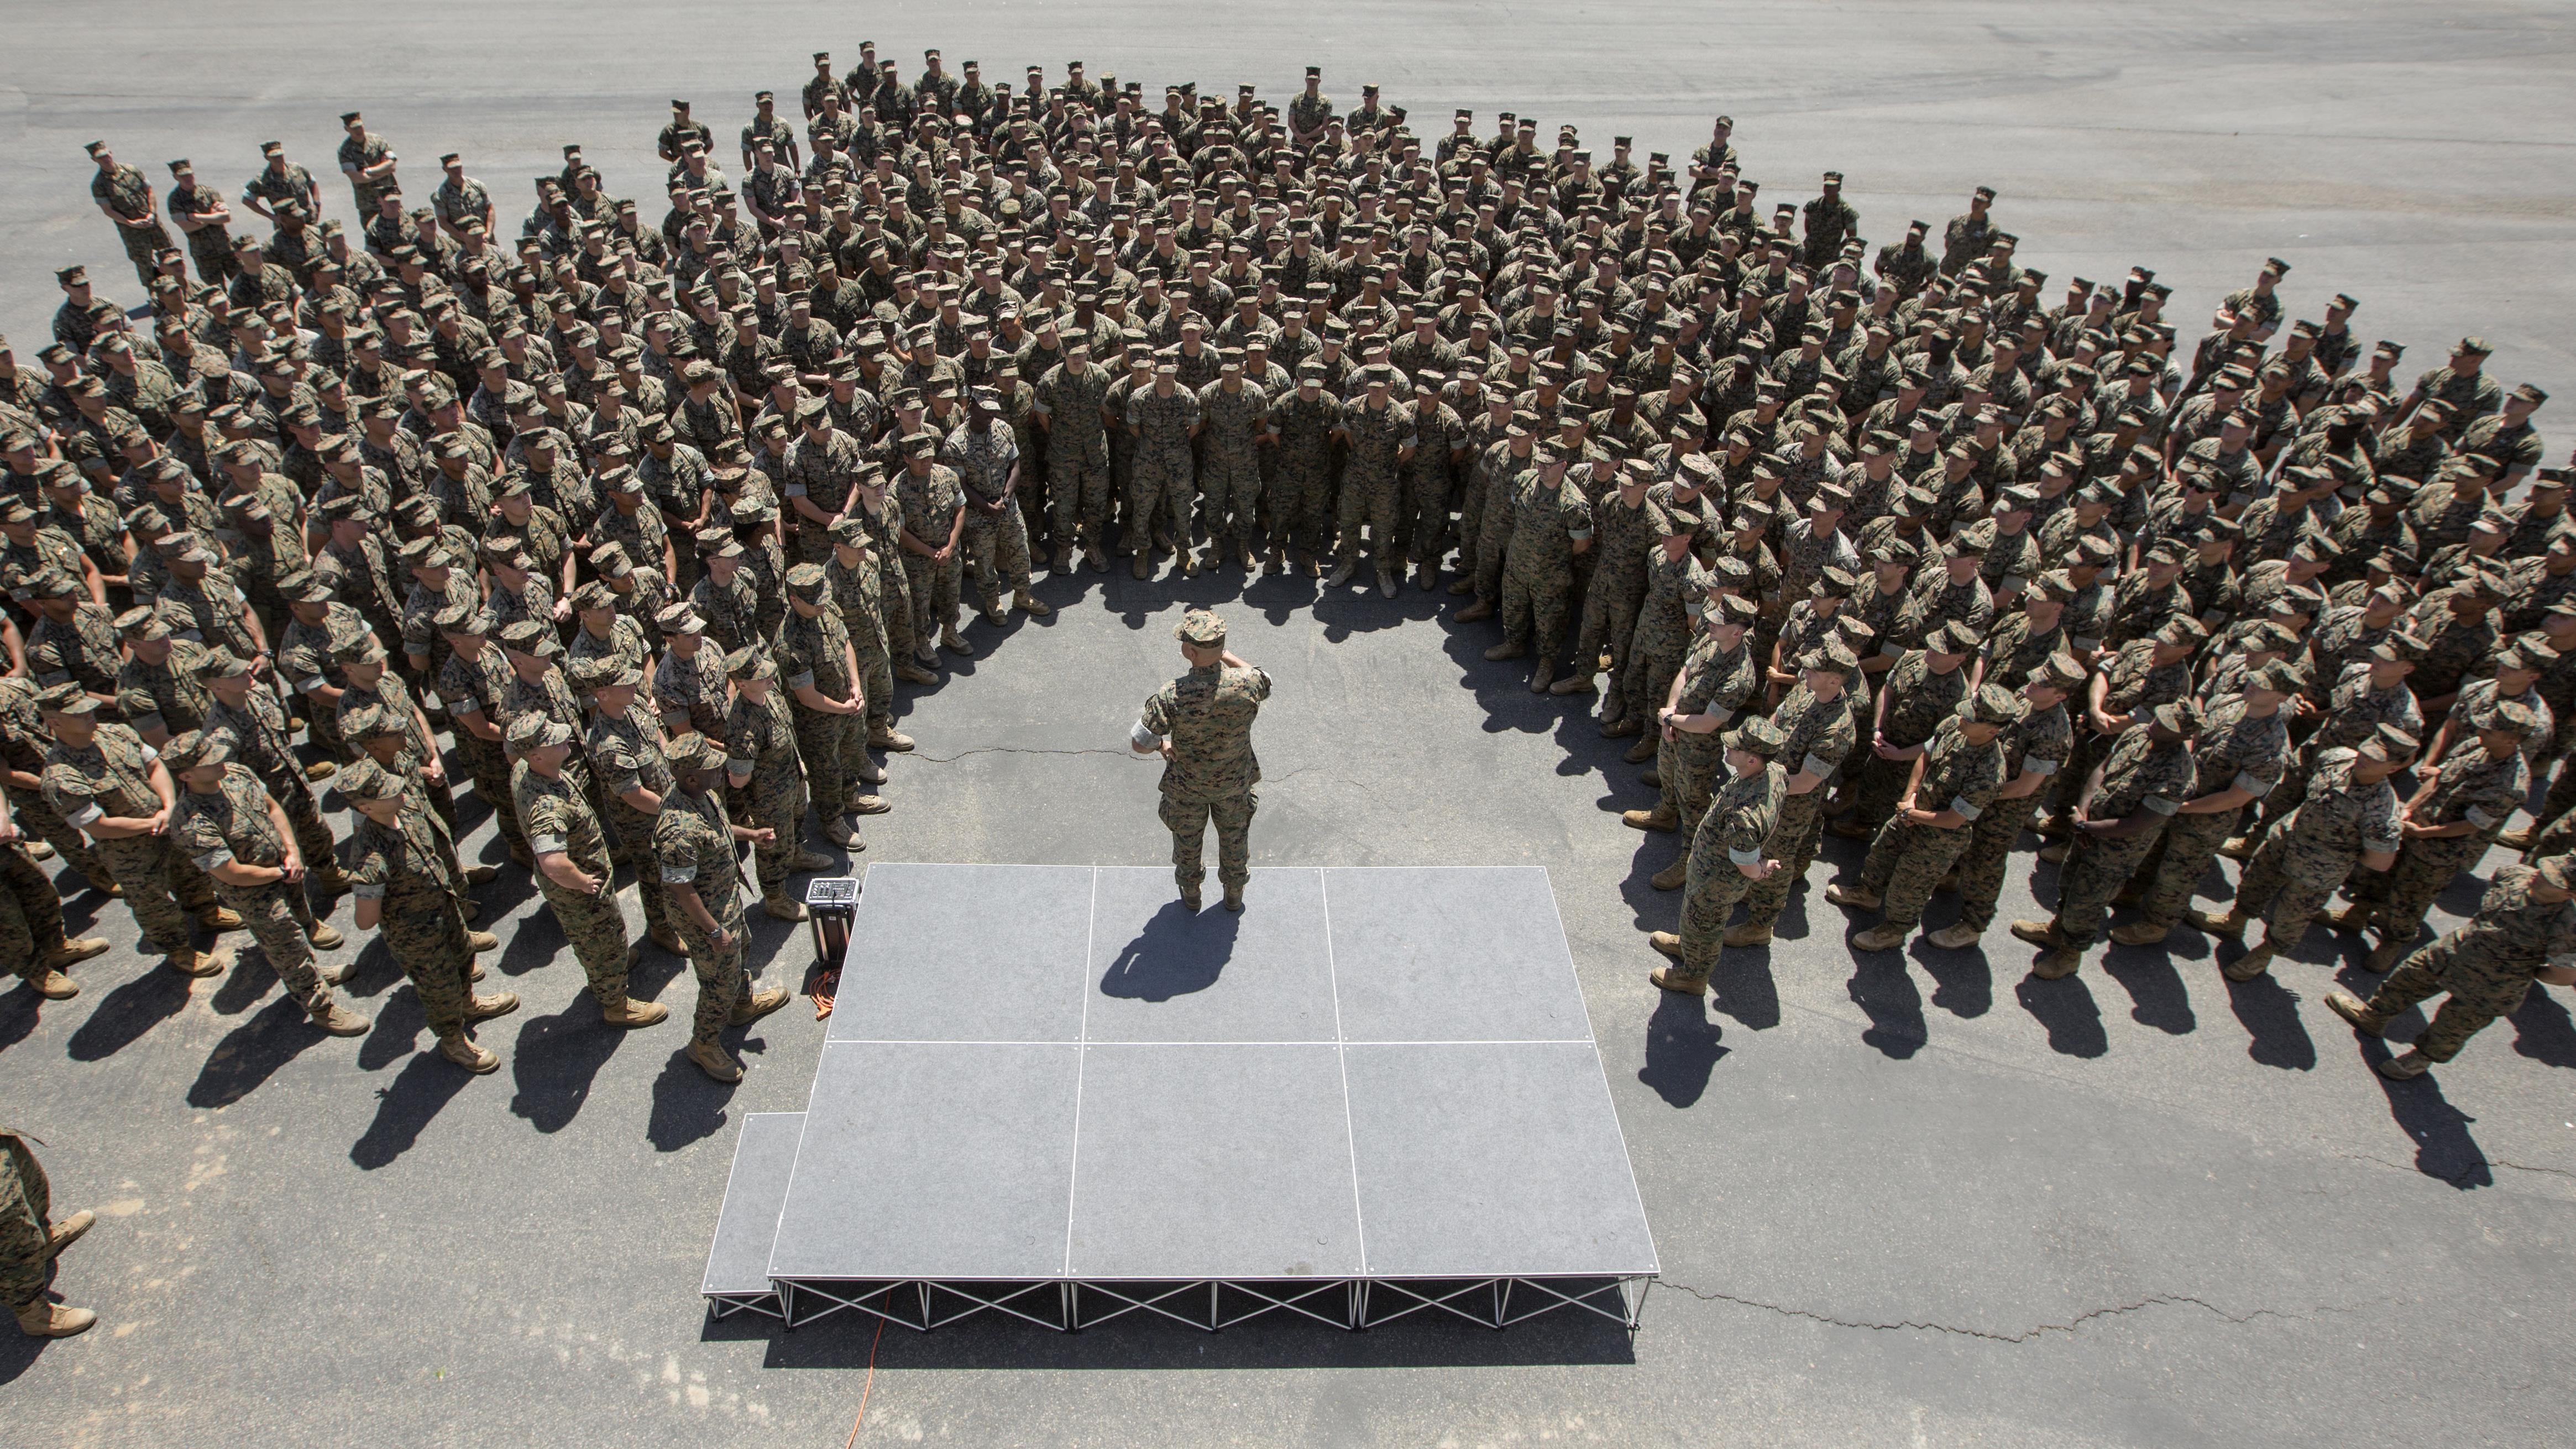 Negotiating Marine Corps Style